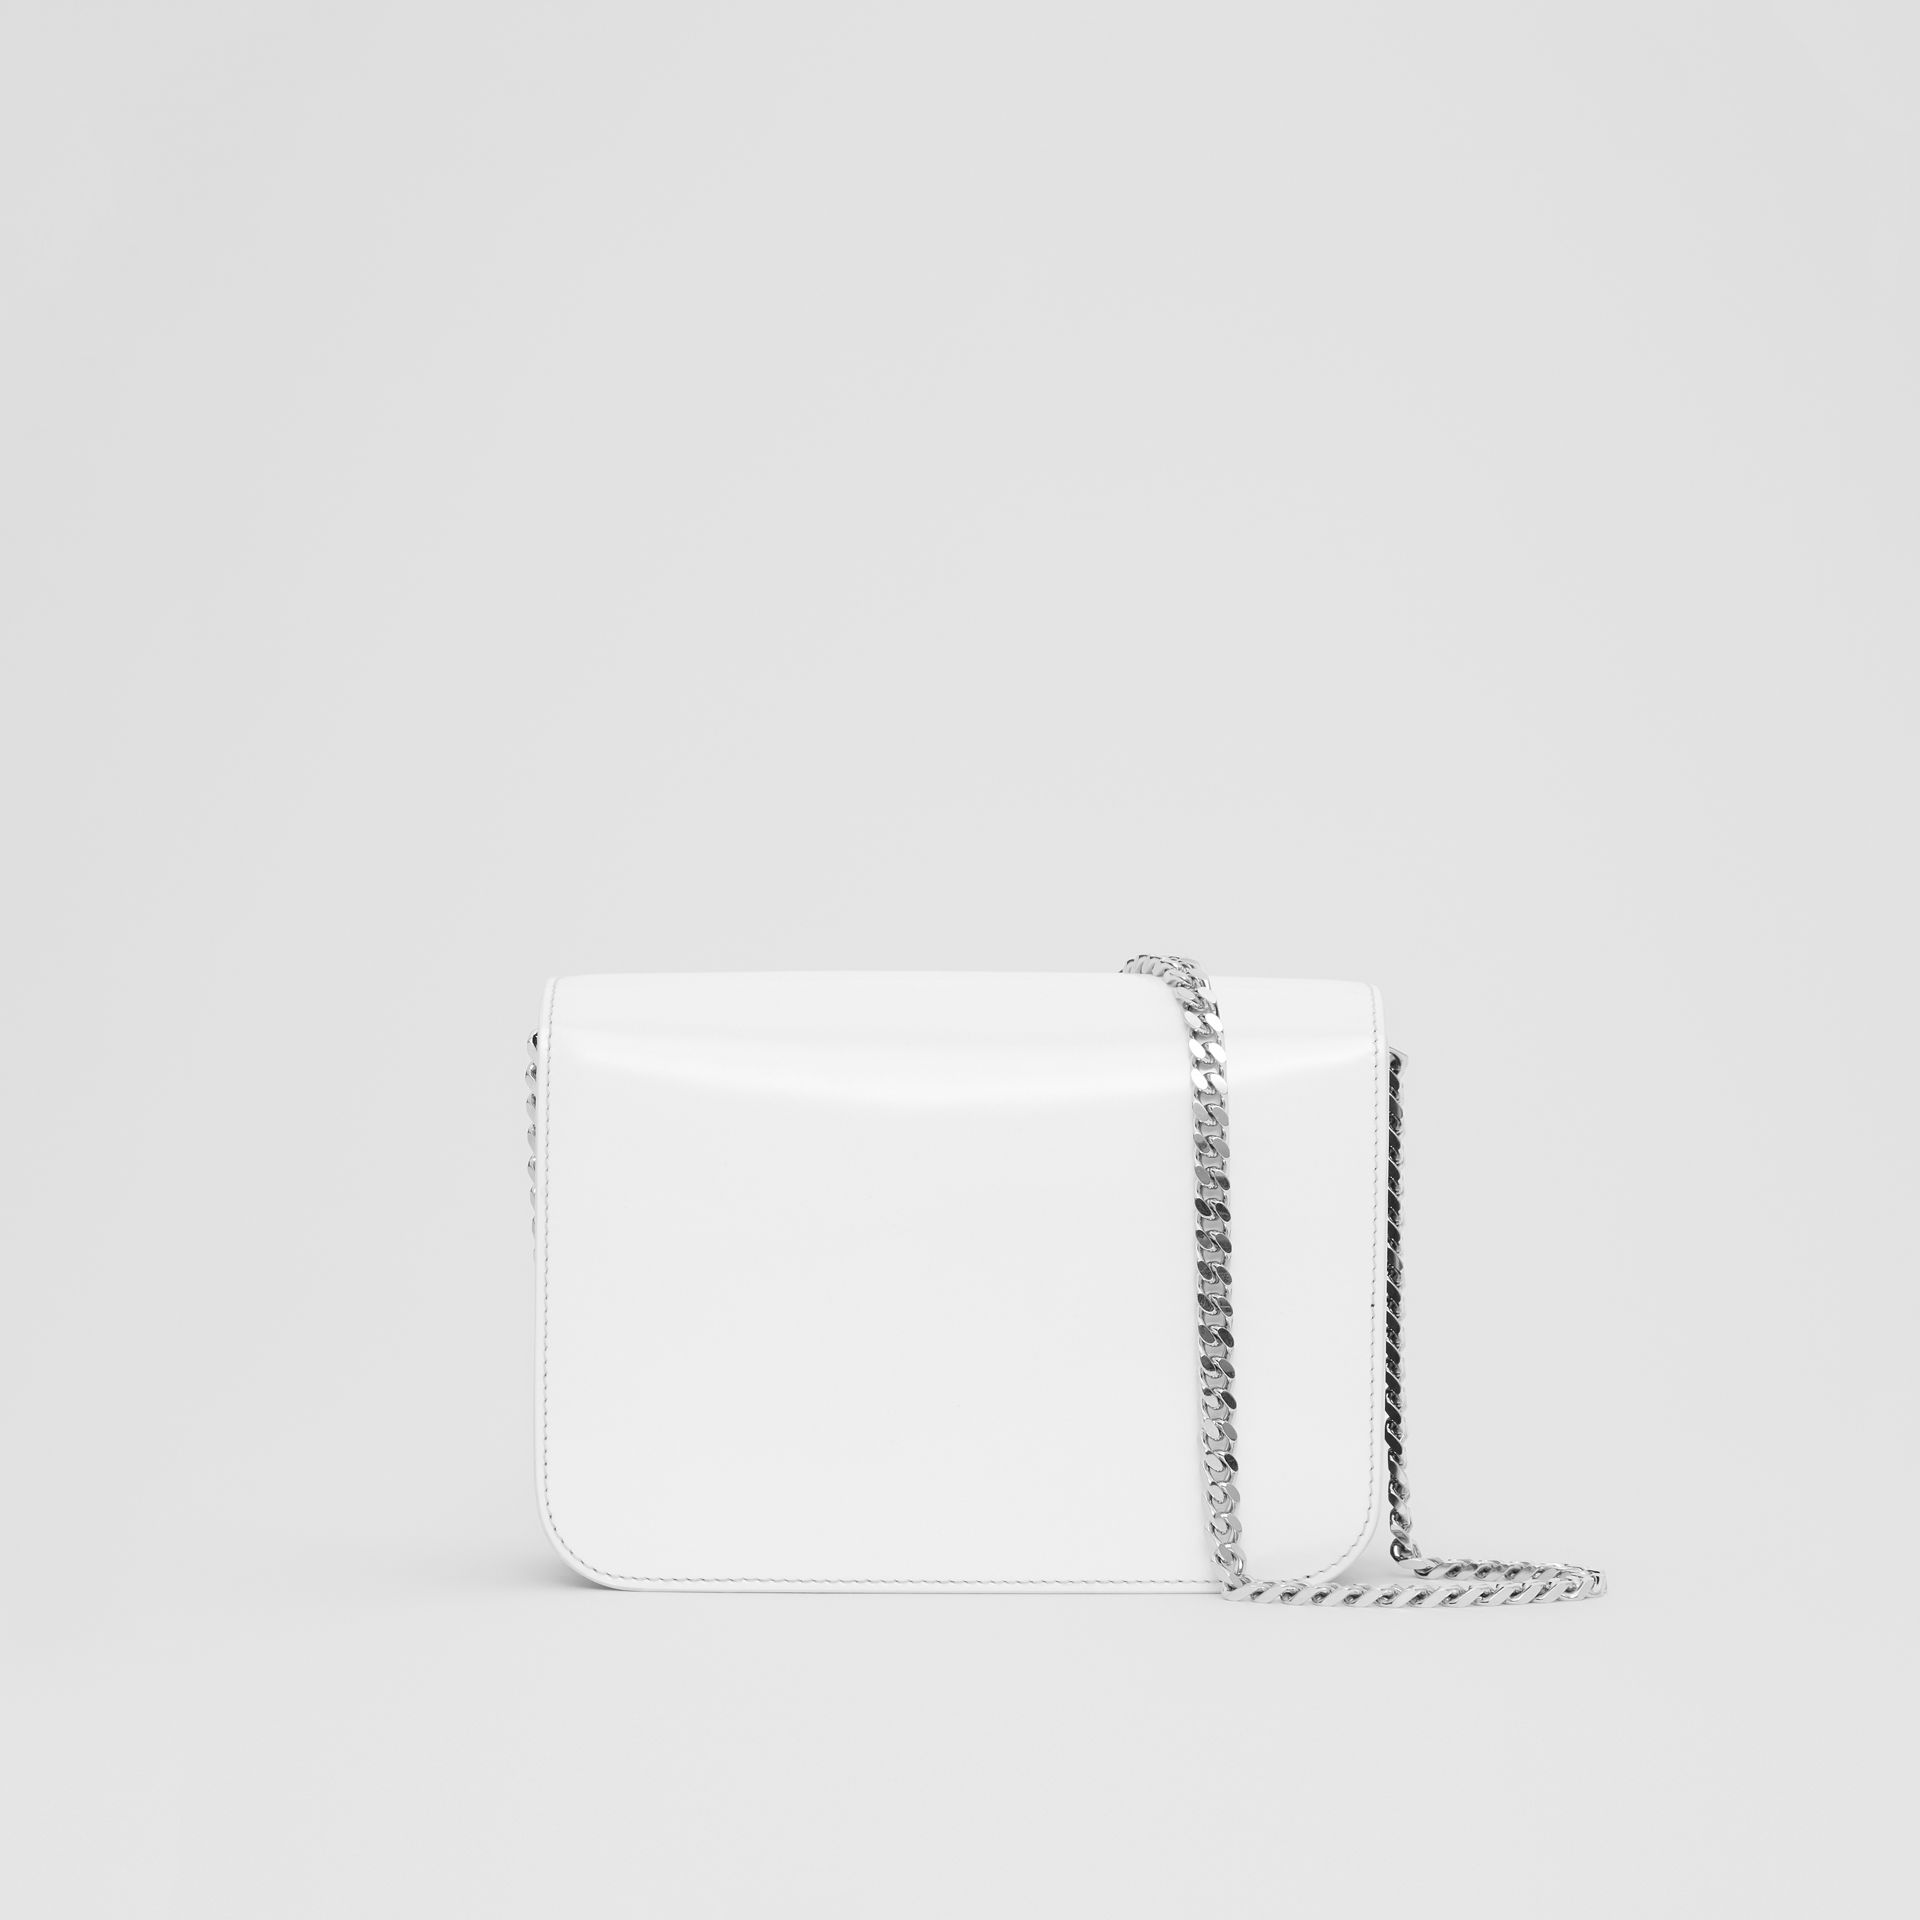 b6293fc014fd Burberry Small Logo Print Leather Tb Bag In Black White